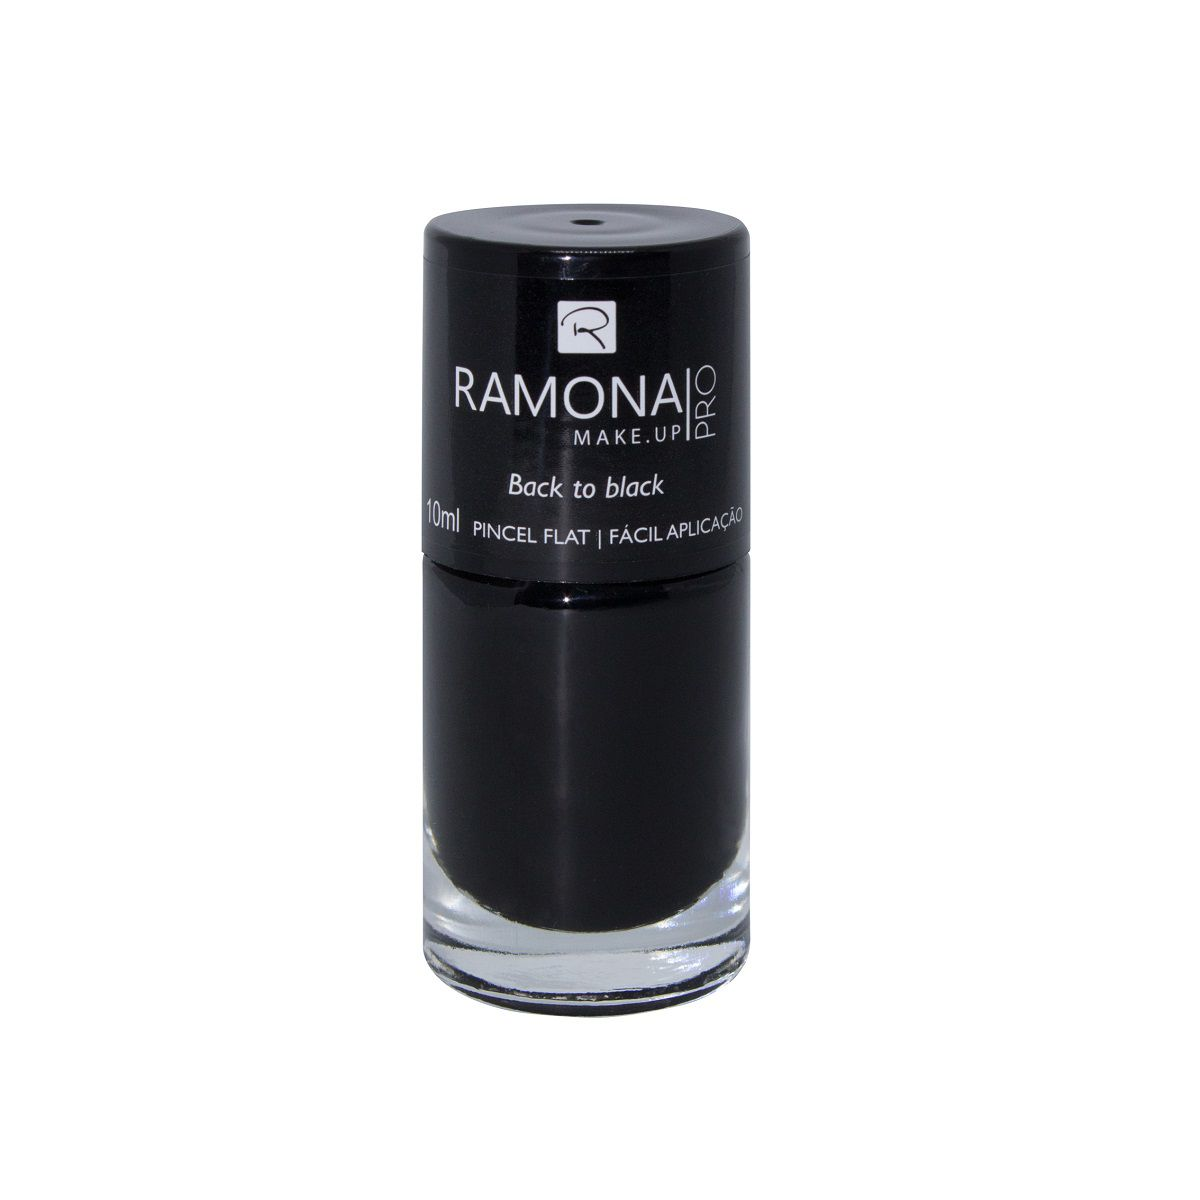 Esmalte cremoso Ramona Cosméticos Back to black 10ml